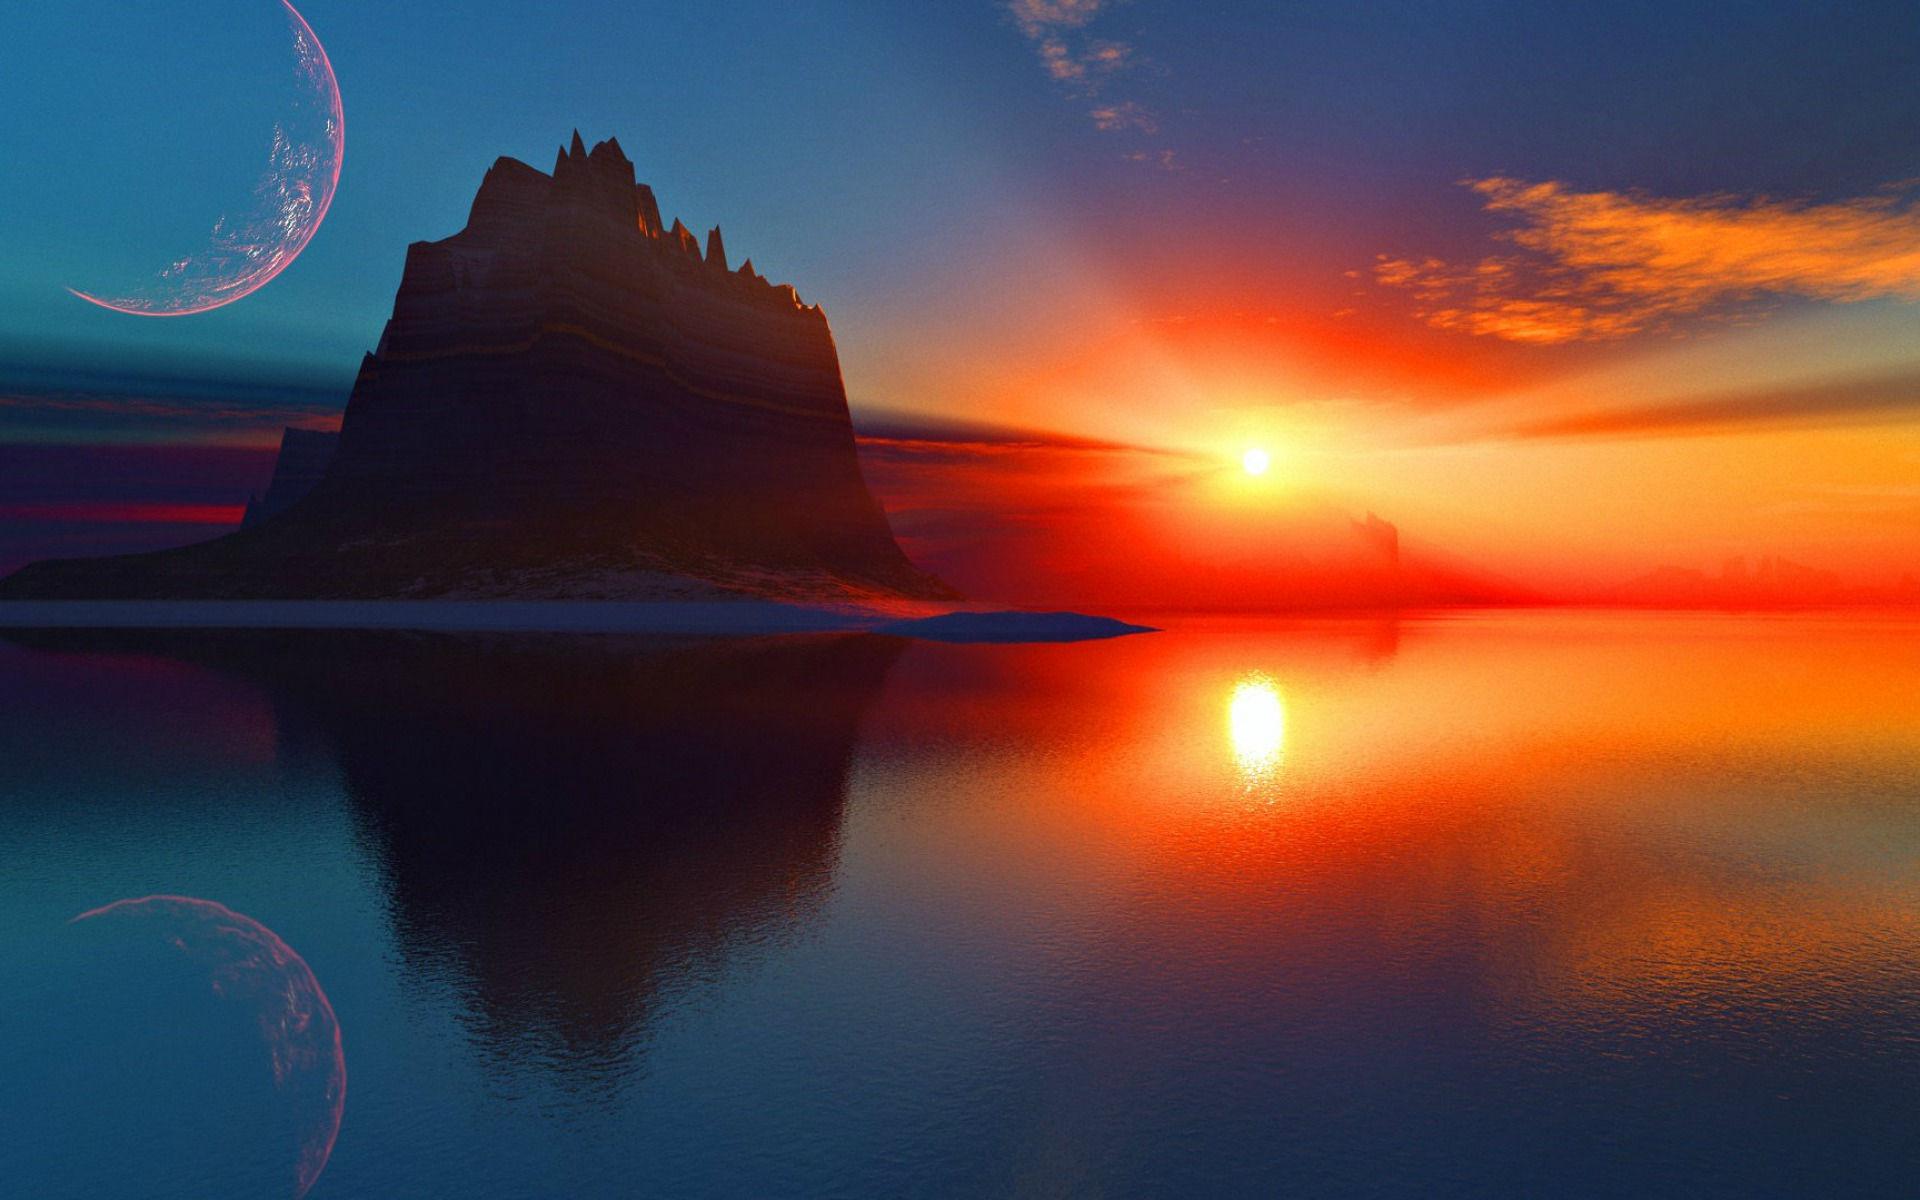 Fonds d 39 cran coucher de soleil maximumwall - Fond ecran coucher de soleil sur la mer ...